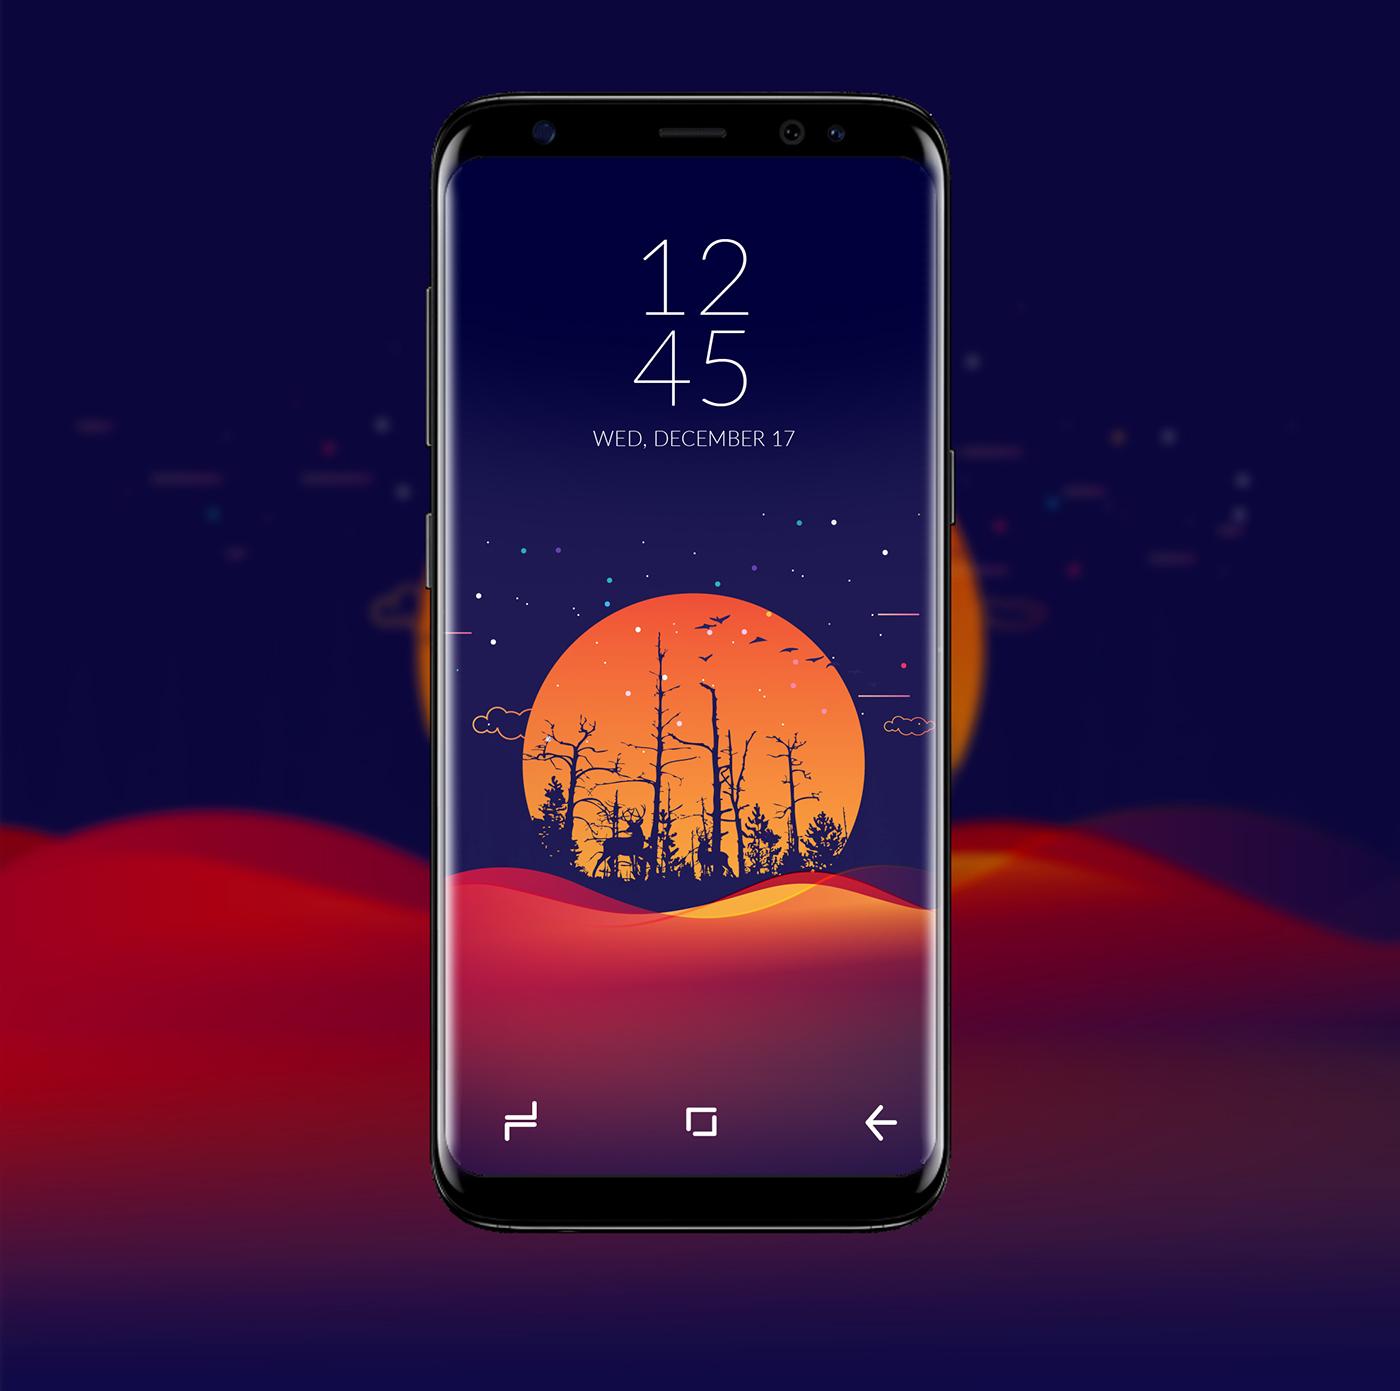 Samsung Galaxy S8 Wallpaper Samsung Galaxy S8 Theme 16210 Hd Wallpaper Backgrounds Download